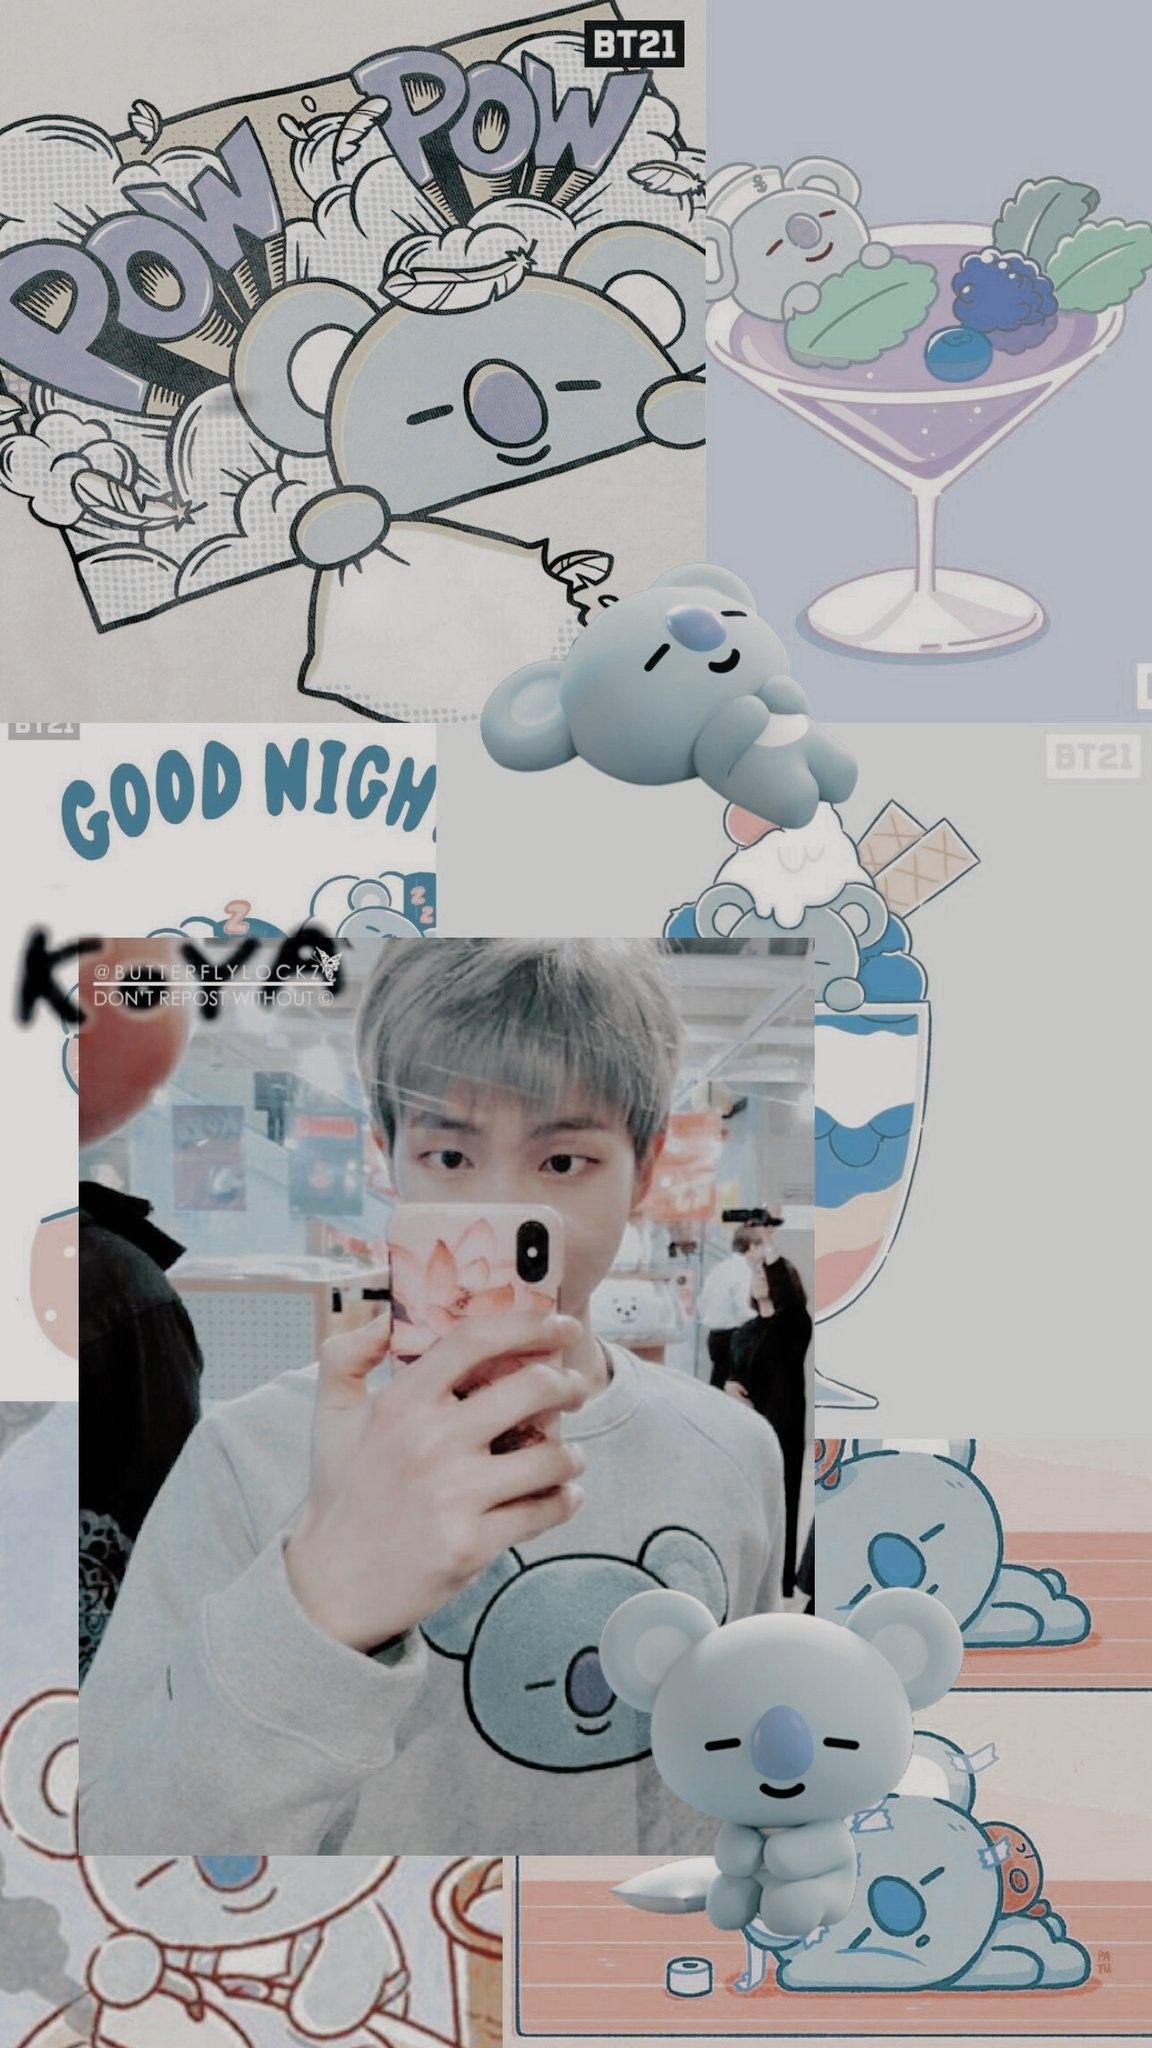 Namjoon Feat Koya Wallpaper Credits To Twitter Butterflylockz C Namjoon Rm Koya Bt21 Ilustrasi Komik Kartu Lucu Wallpaper Lucu